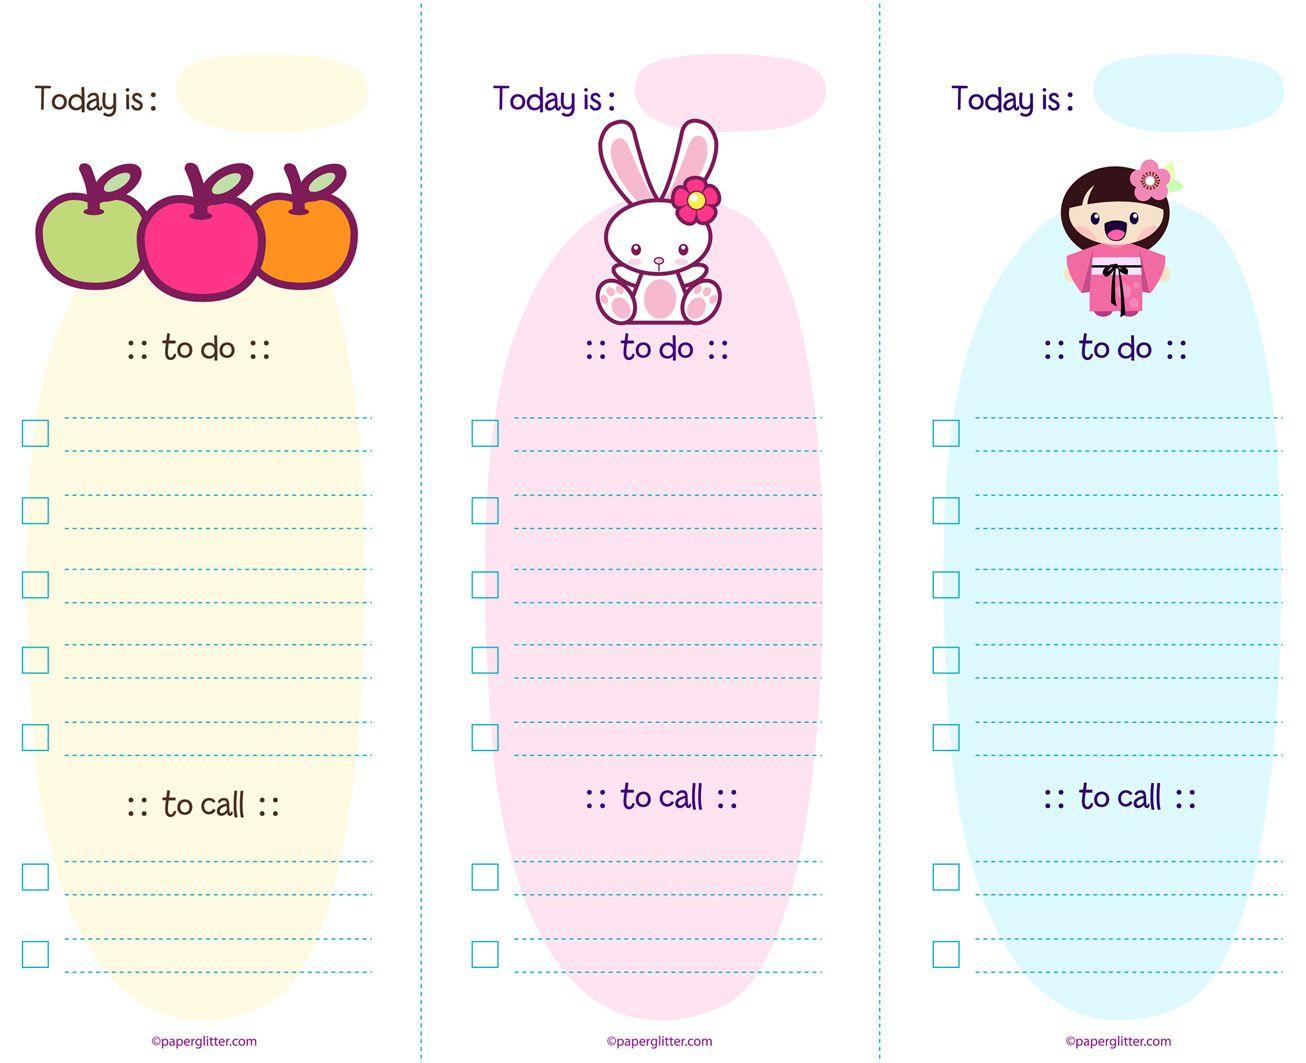 Free Kawaii To Do List Paper Glitter Kawaii Printables Planner Addicts Filofax Planners Cute to do list template